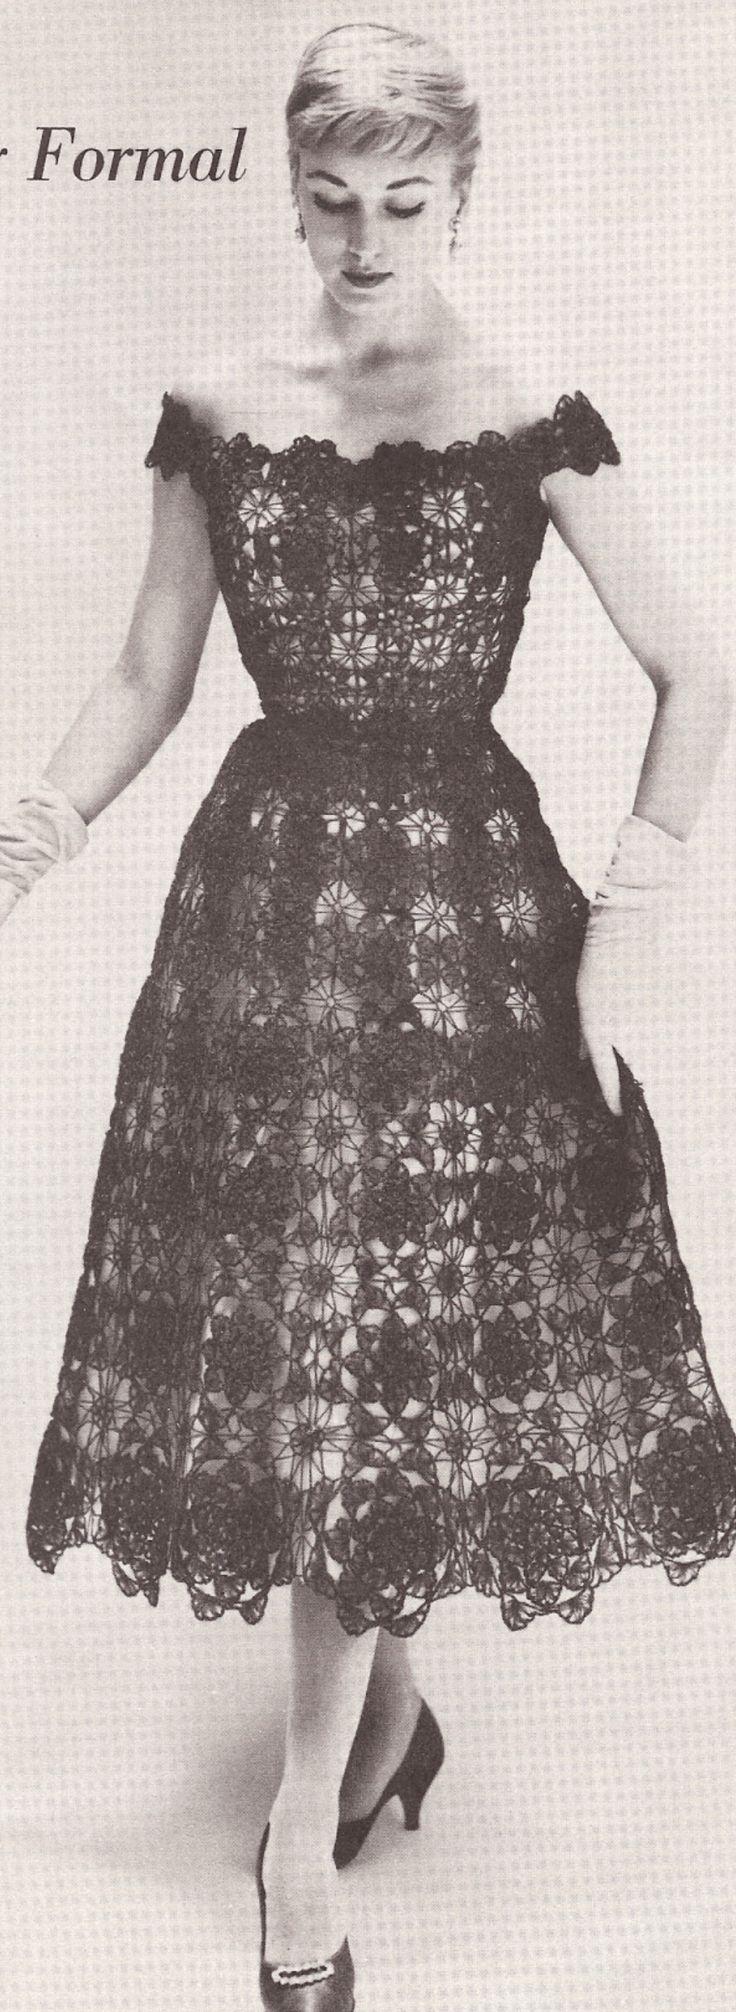 Vintage Crochet Lace Formal Evening Dress PATTERN 1950s